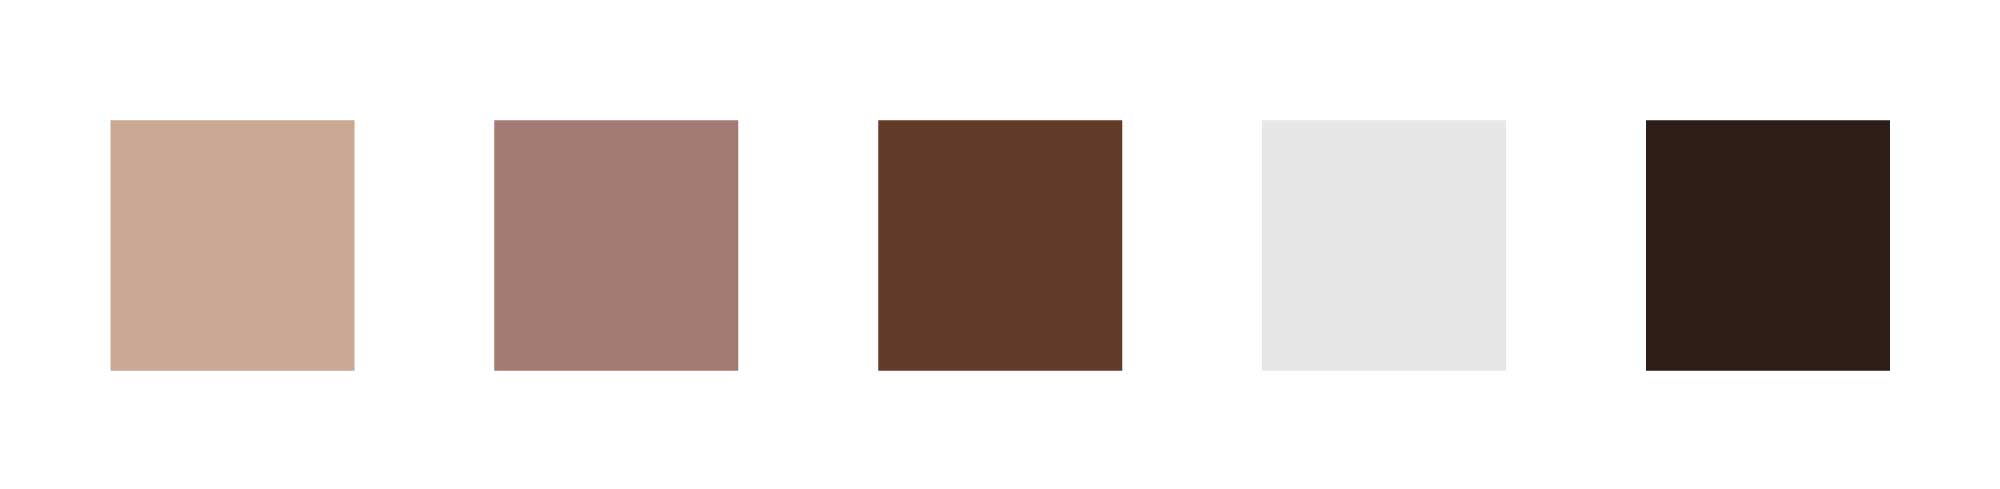 Beechwood-ranch-colors.jpg